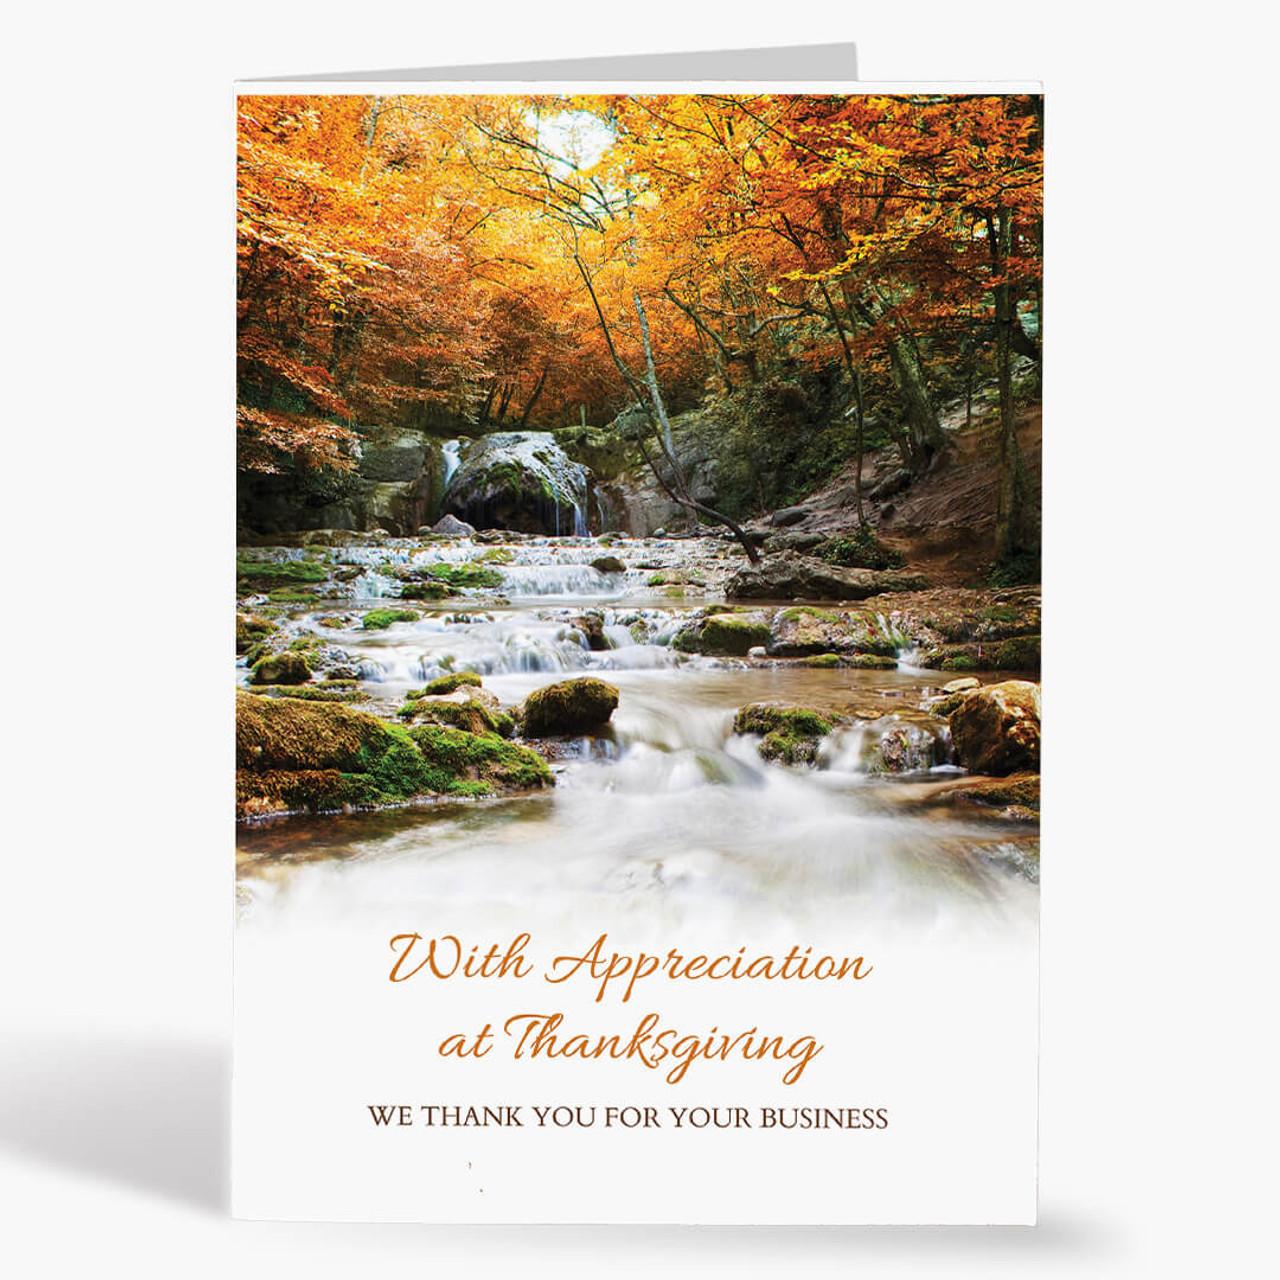 Appreciation Waterfall Thanksgiving Card